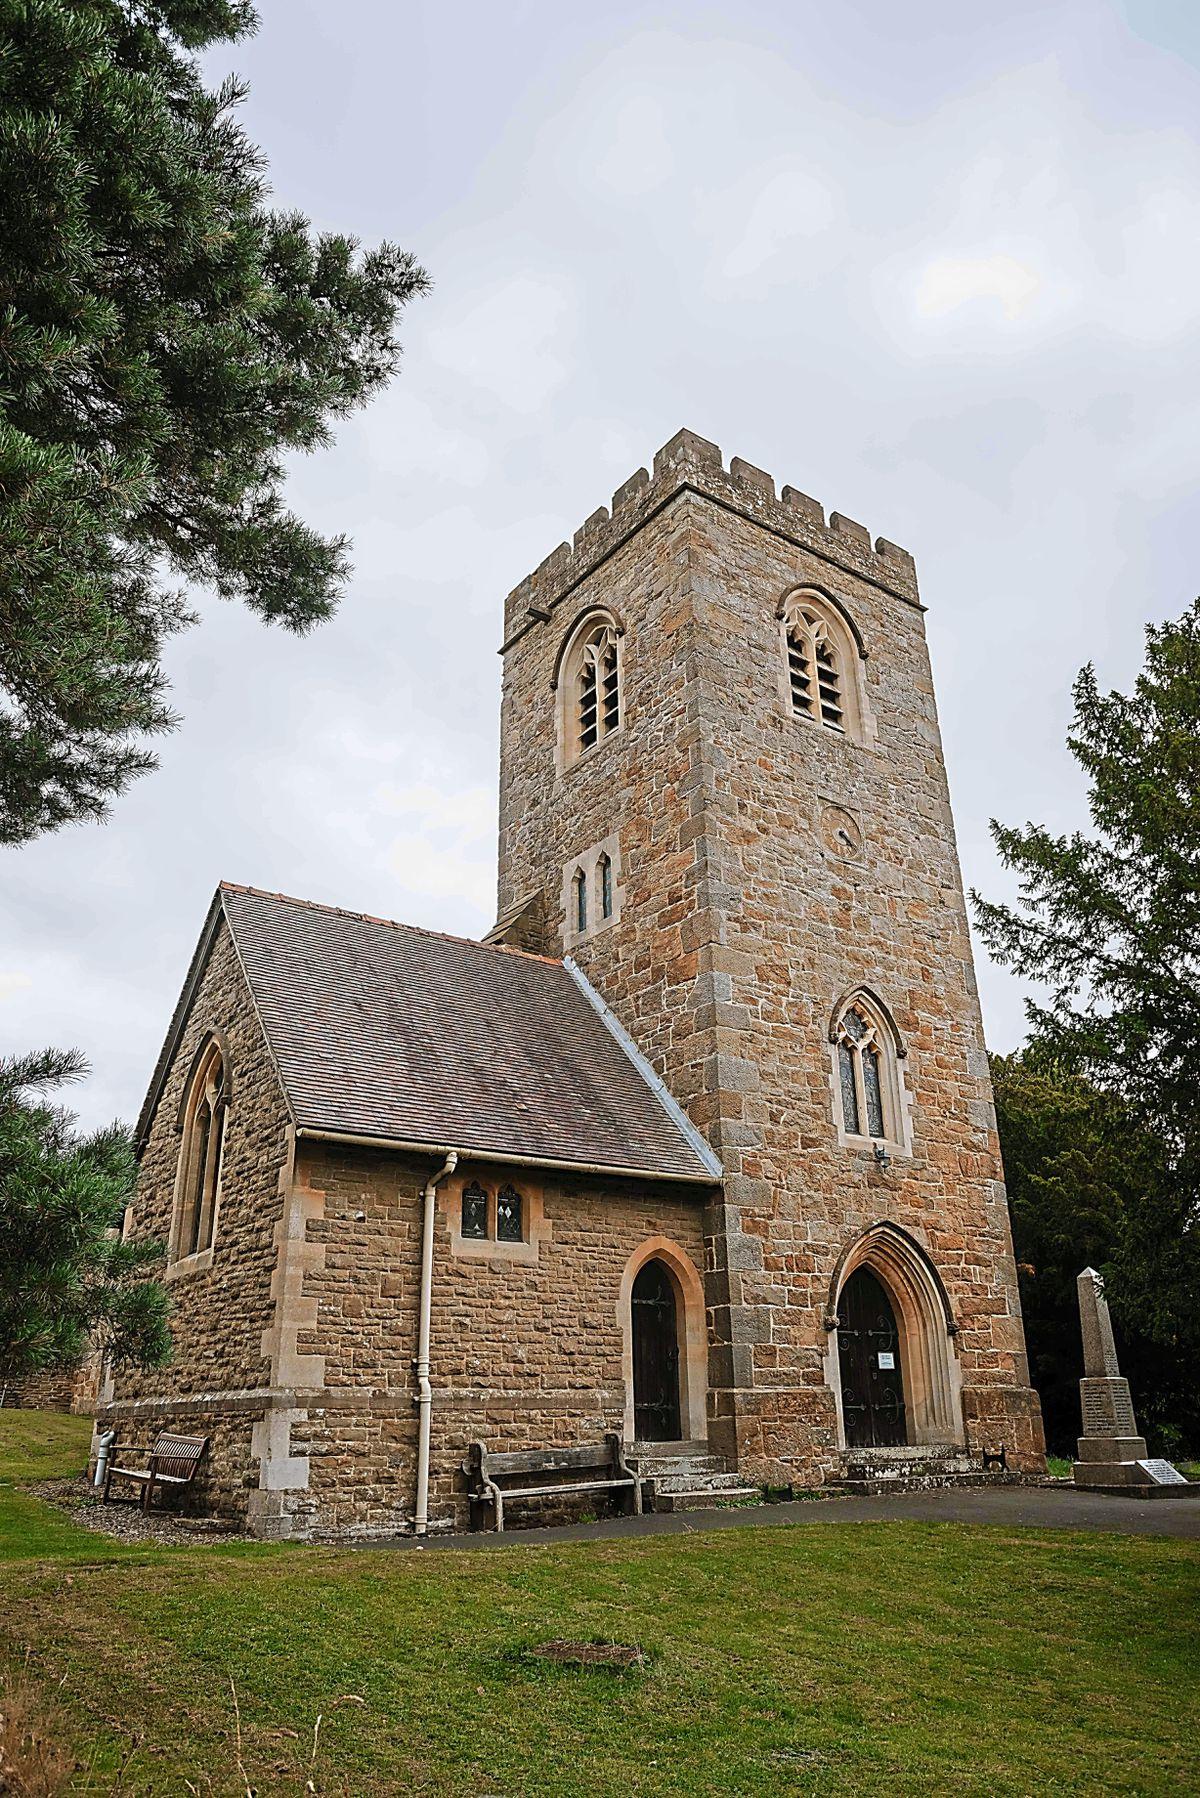 St Paul's Church in Knowbury